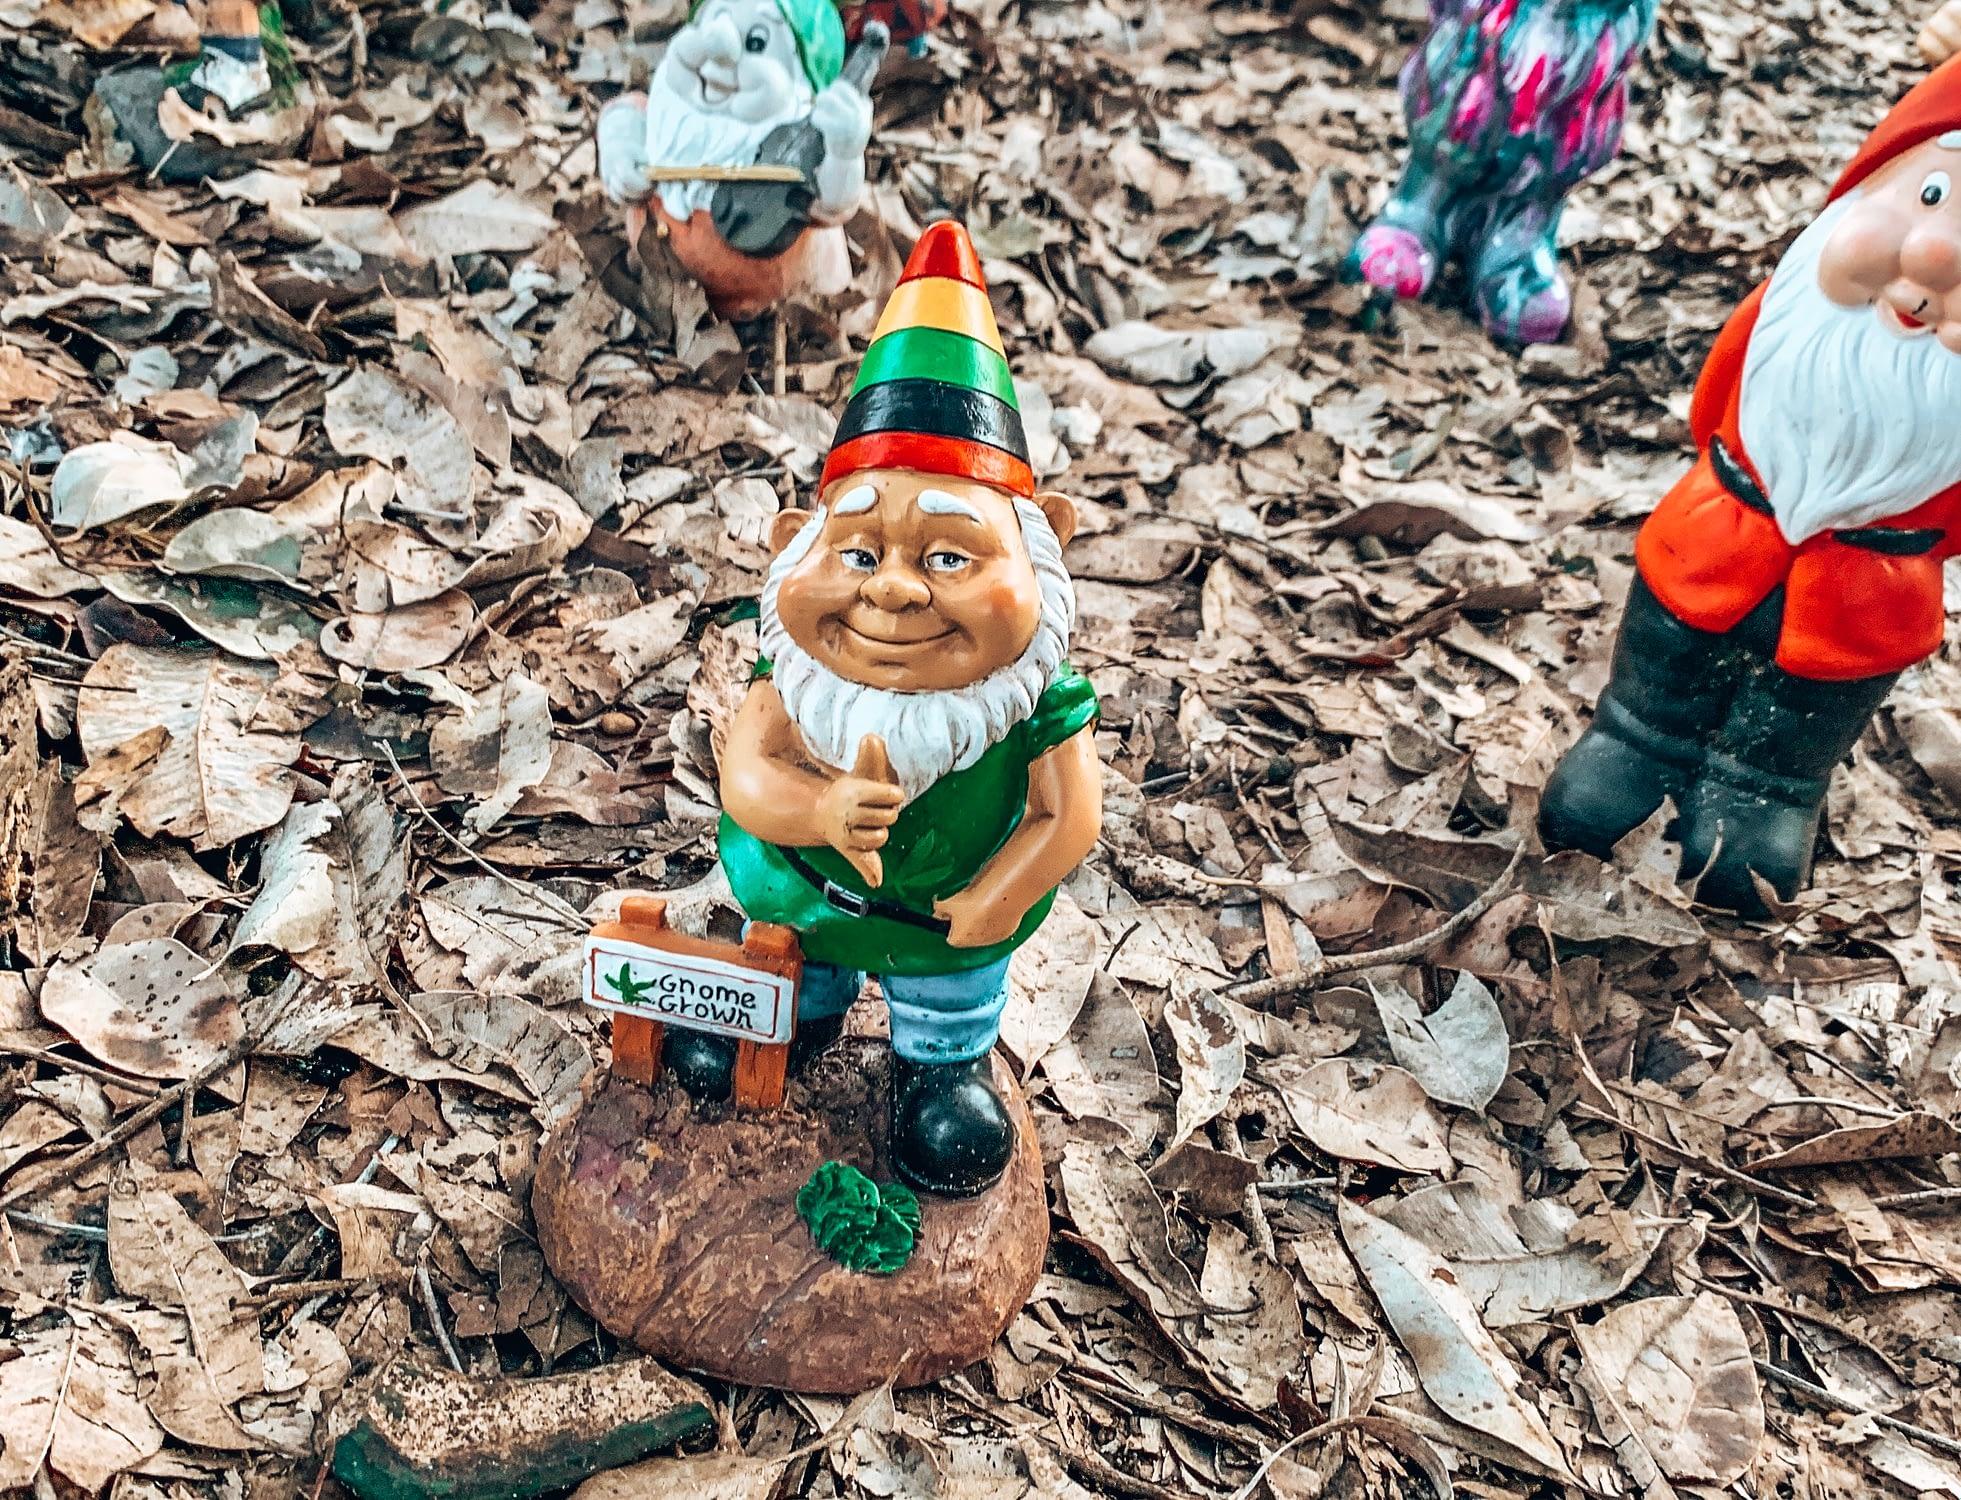 Gnomesville - Gnome painted like a Rastafarian